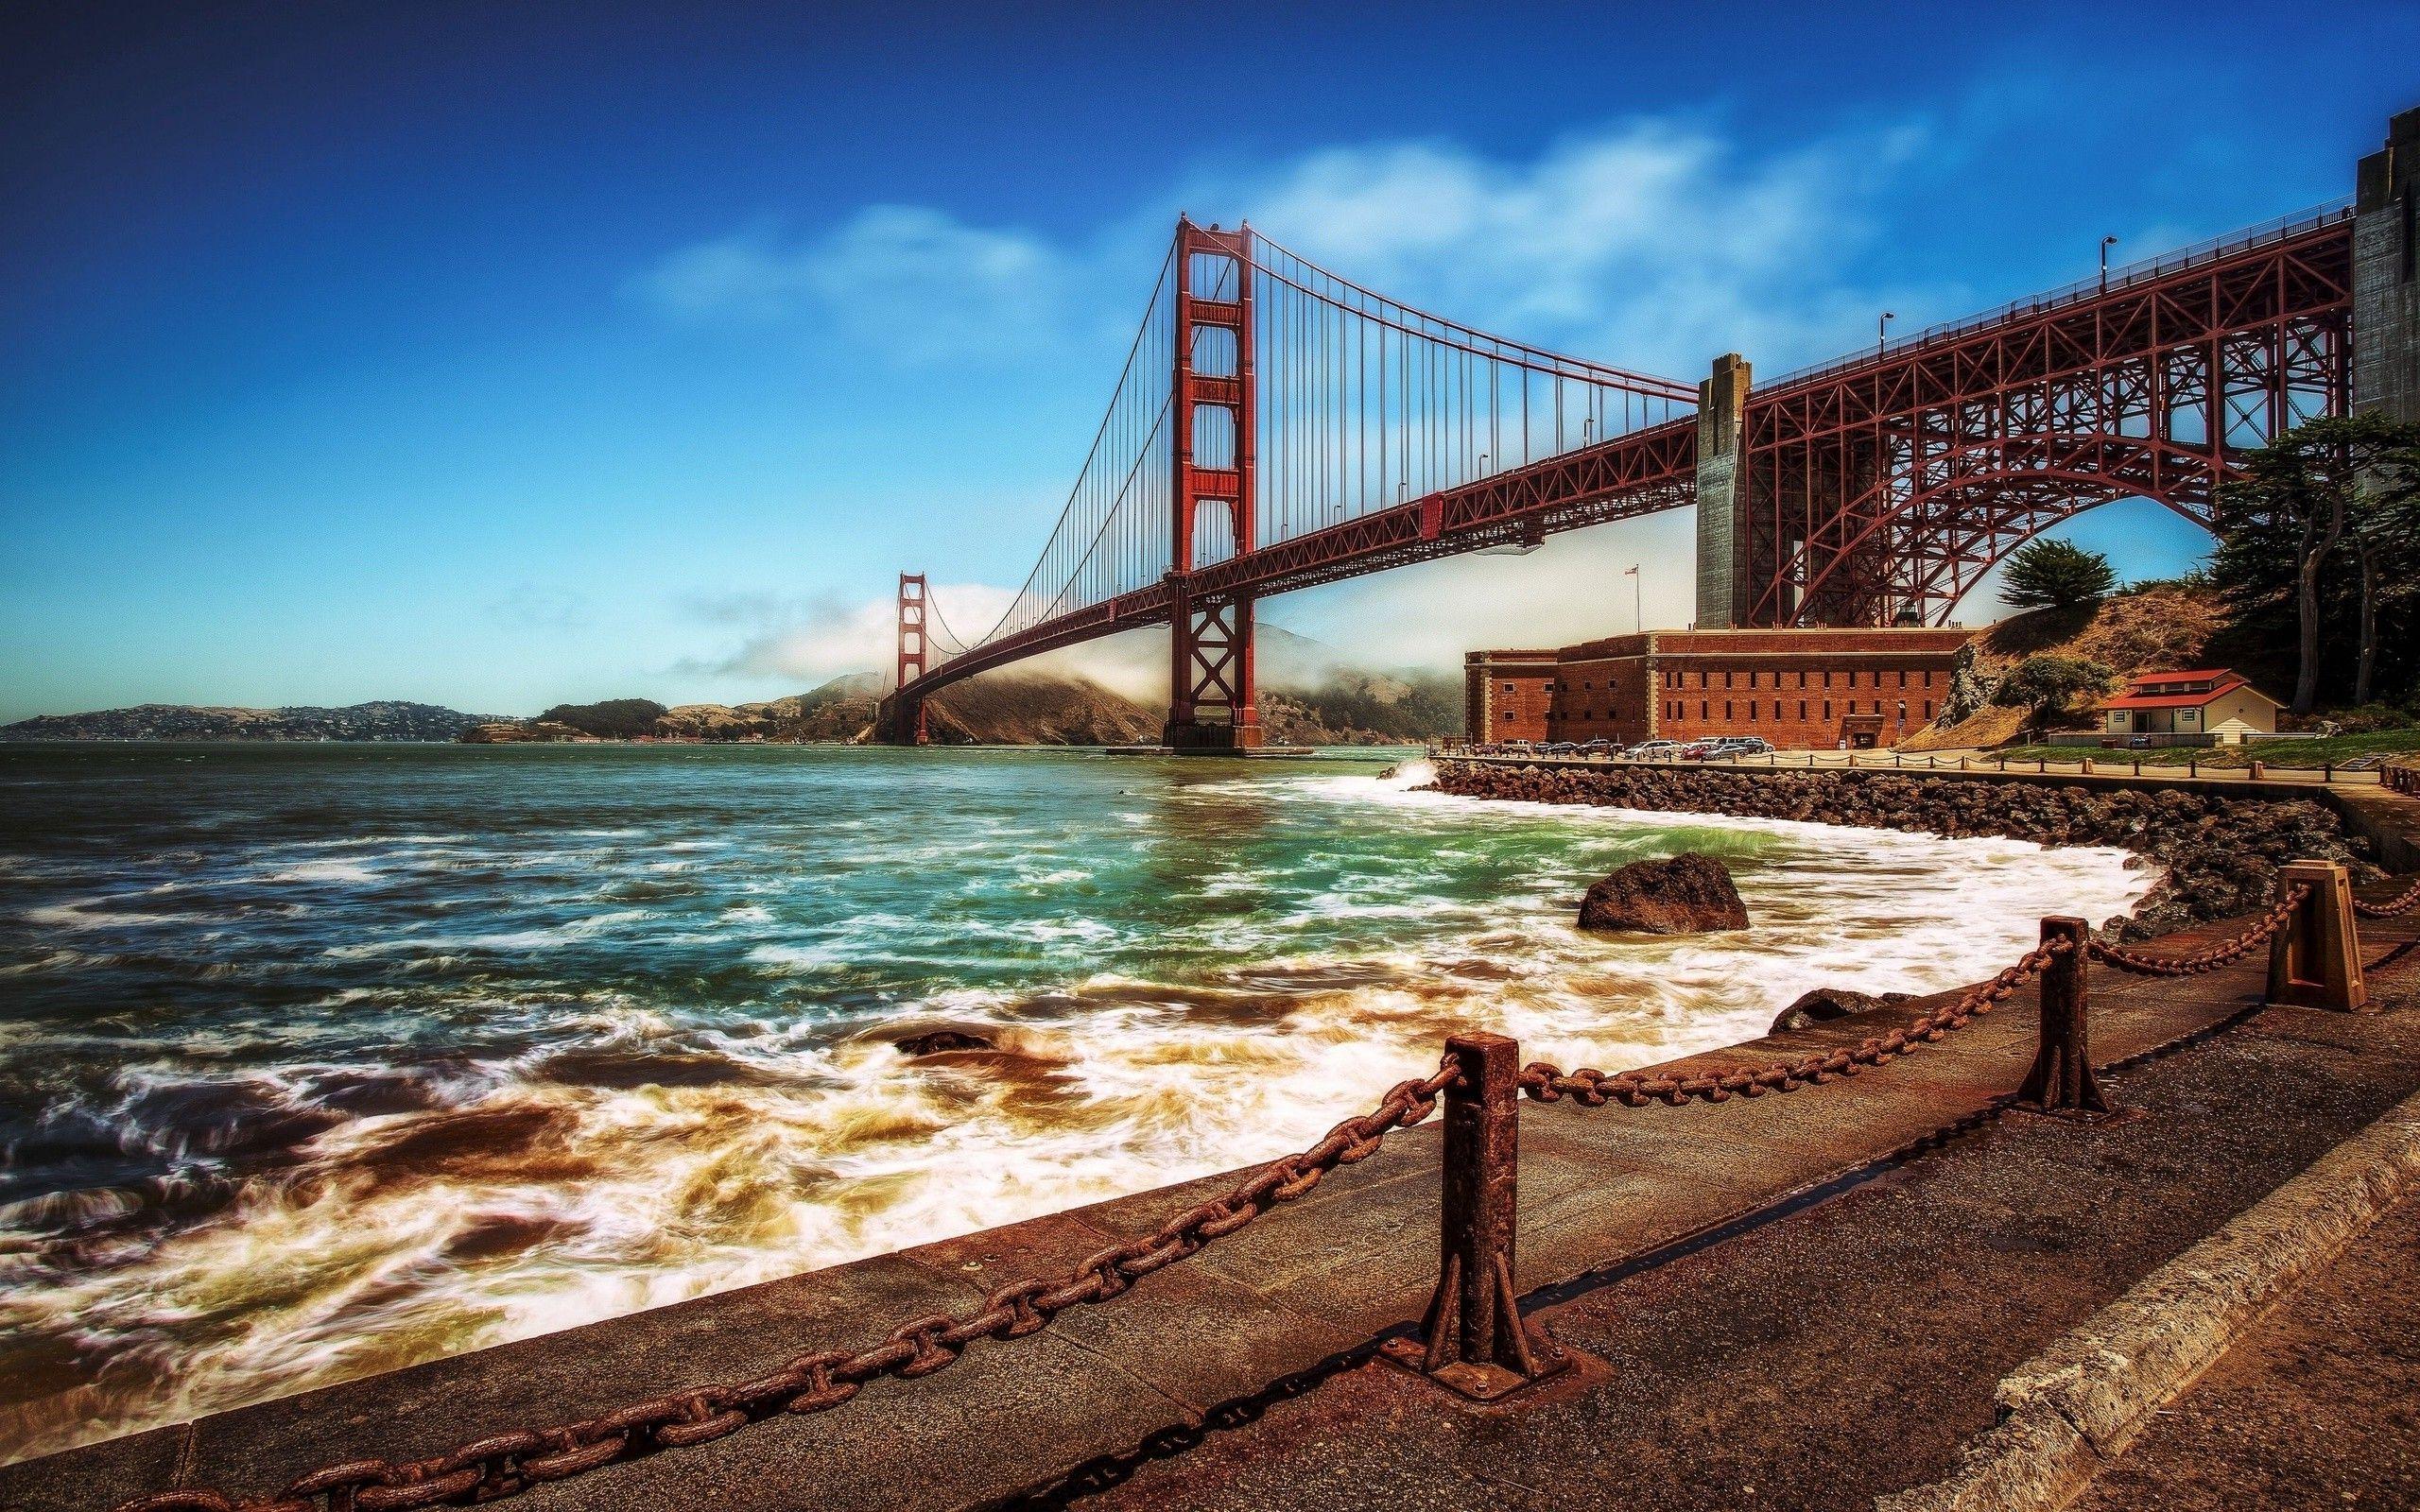 Golden Gate Bridge Evening San Francisco Wallpapers Wallpaper Cave